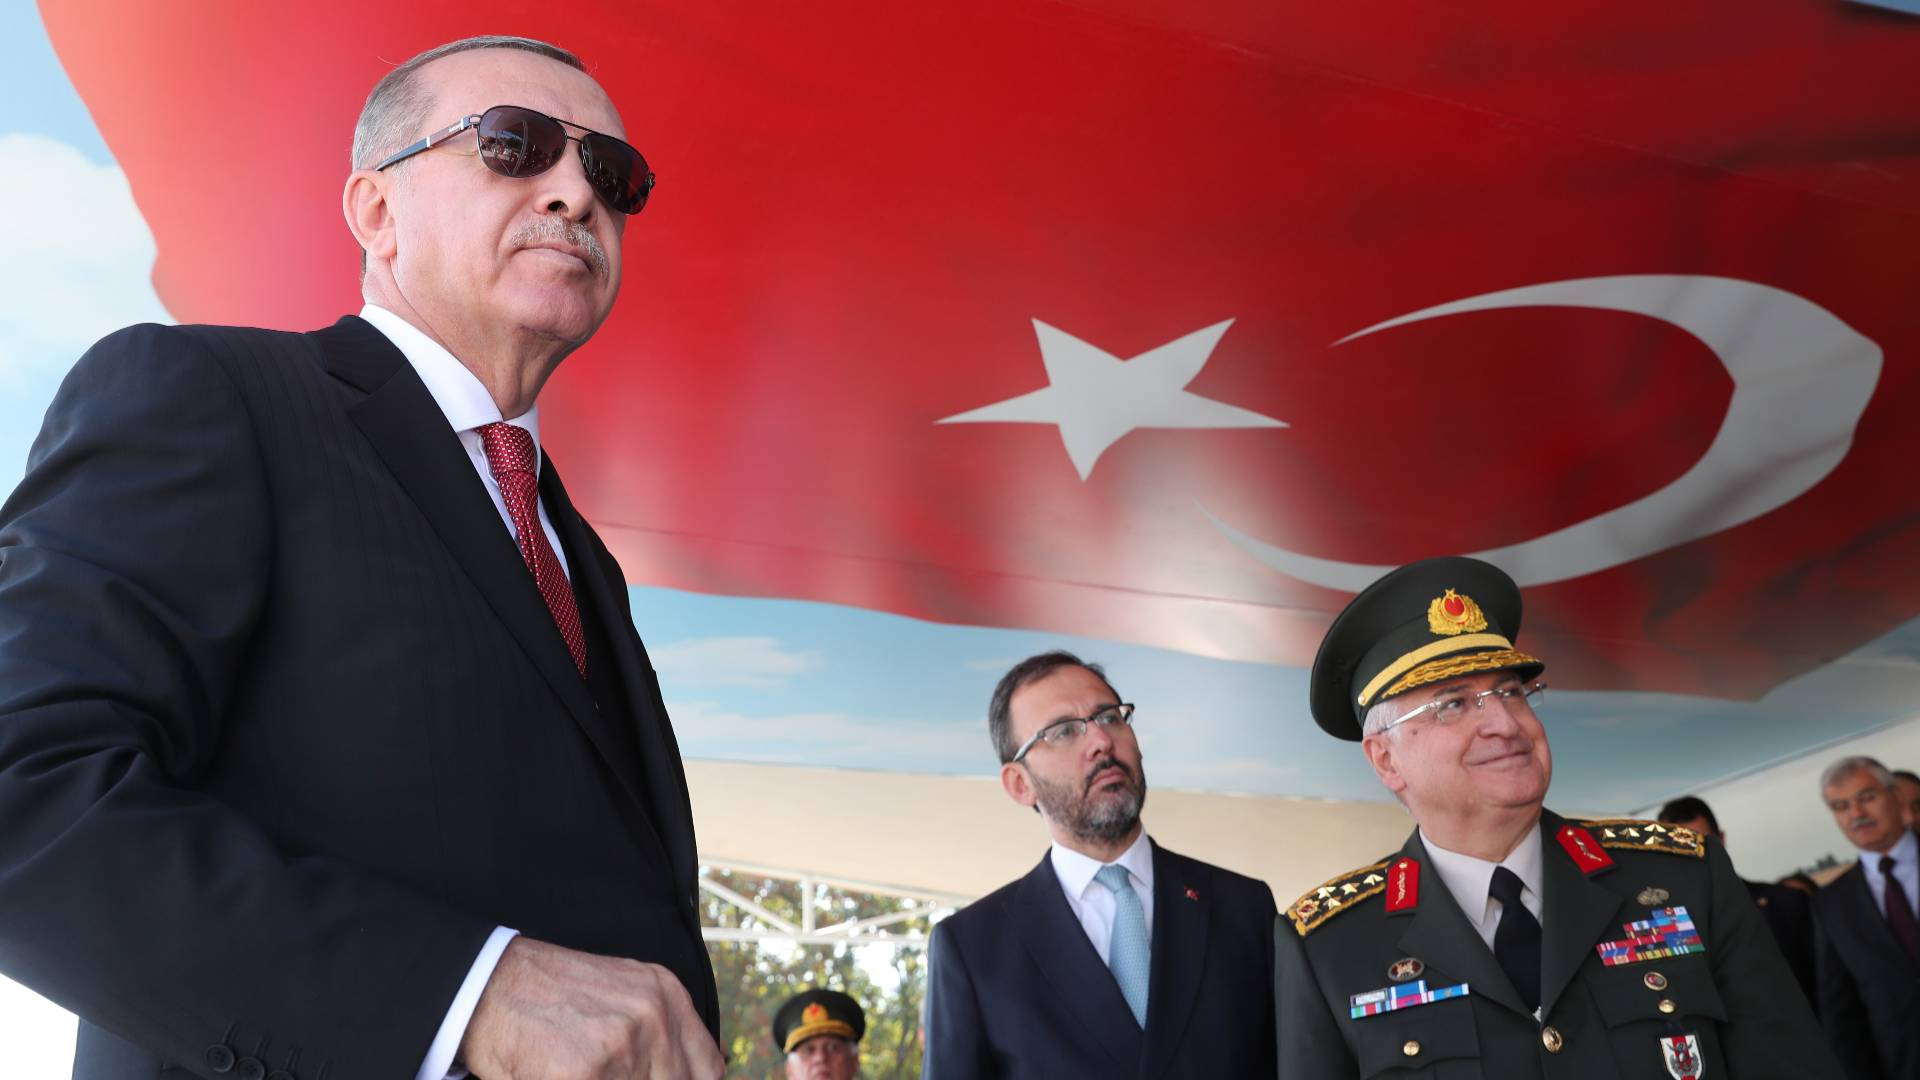 Ядерная мечта Эрдогана. Когда Турция создаст ядерную бомбу